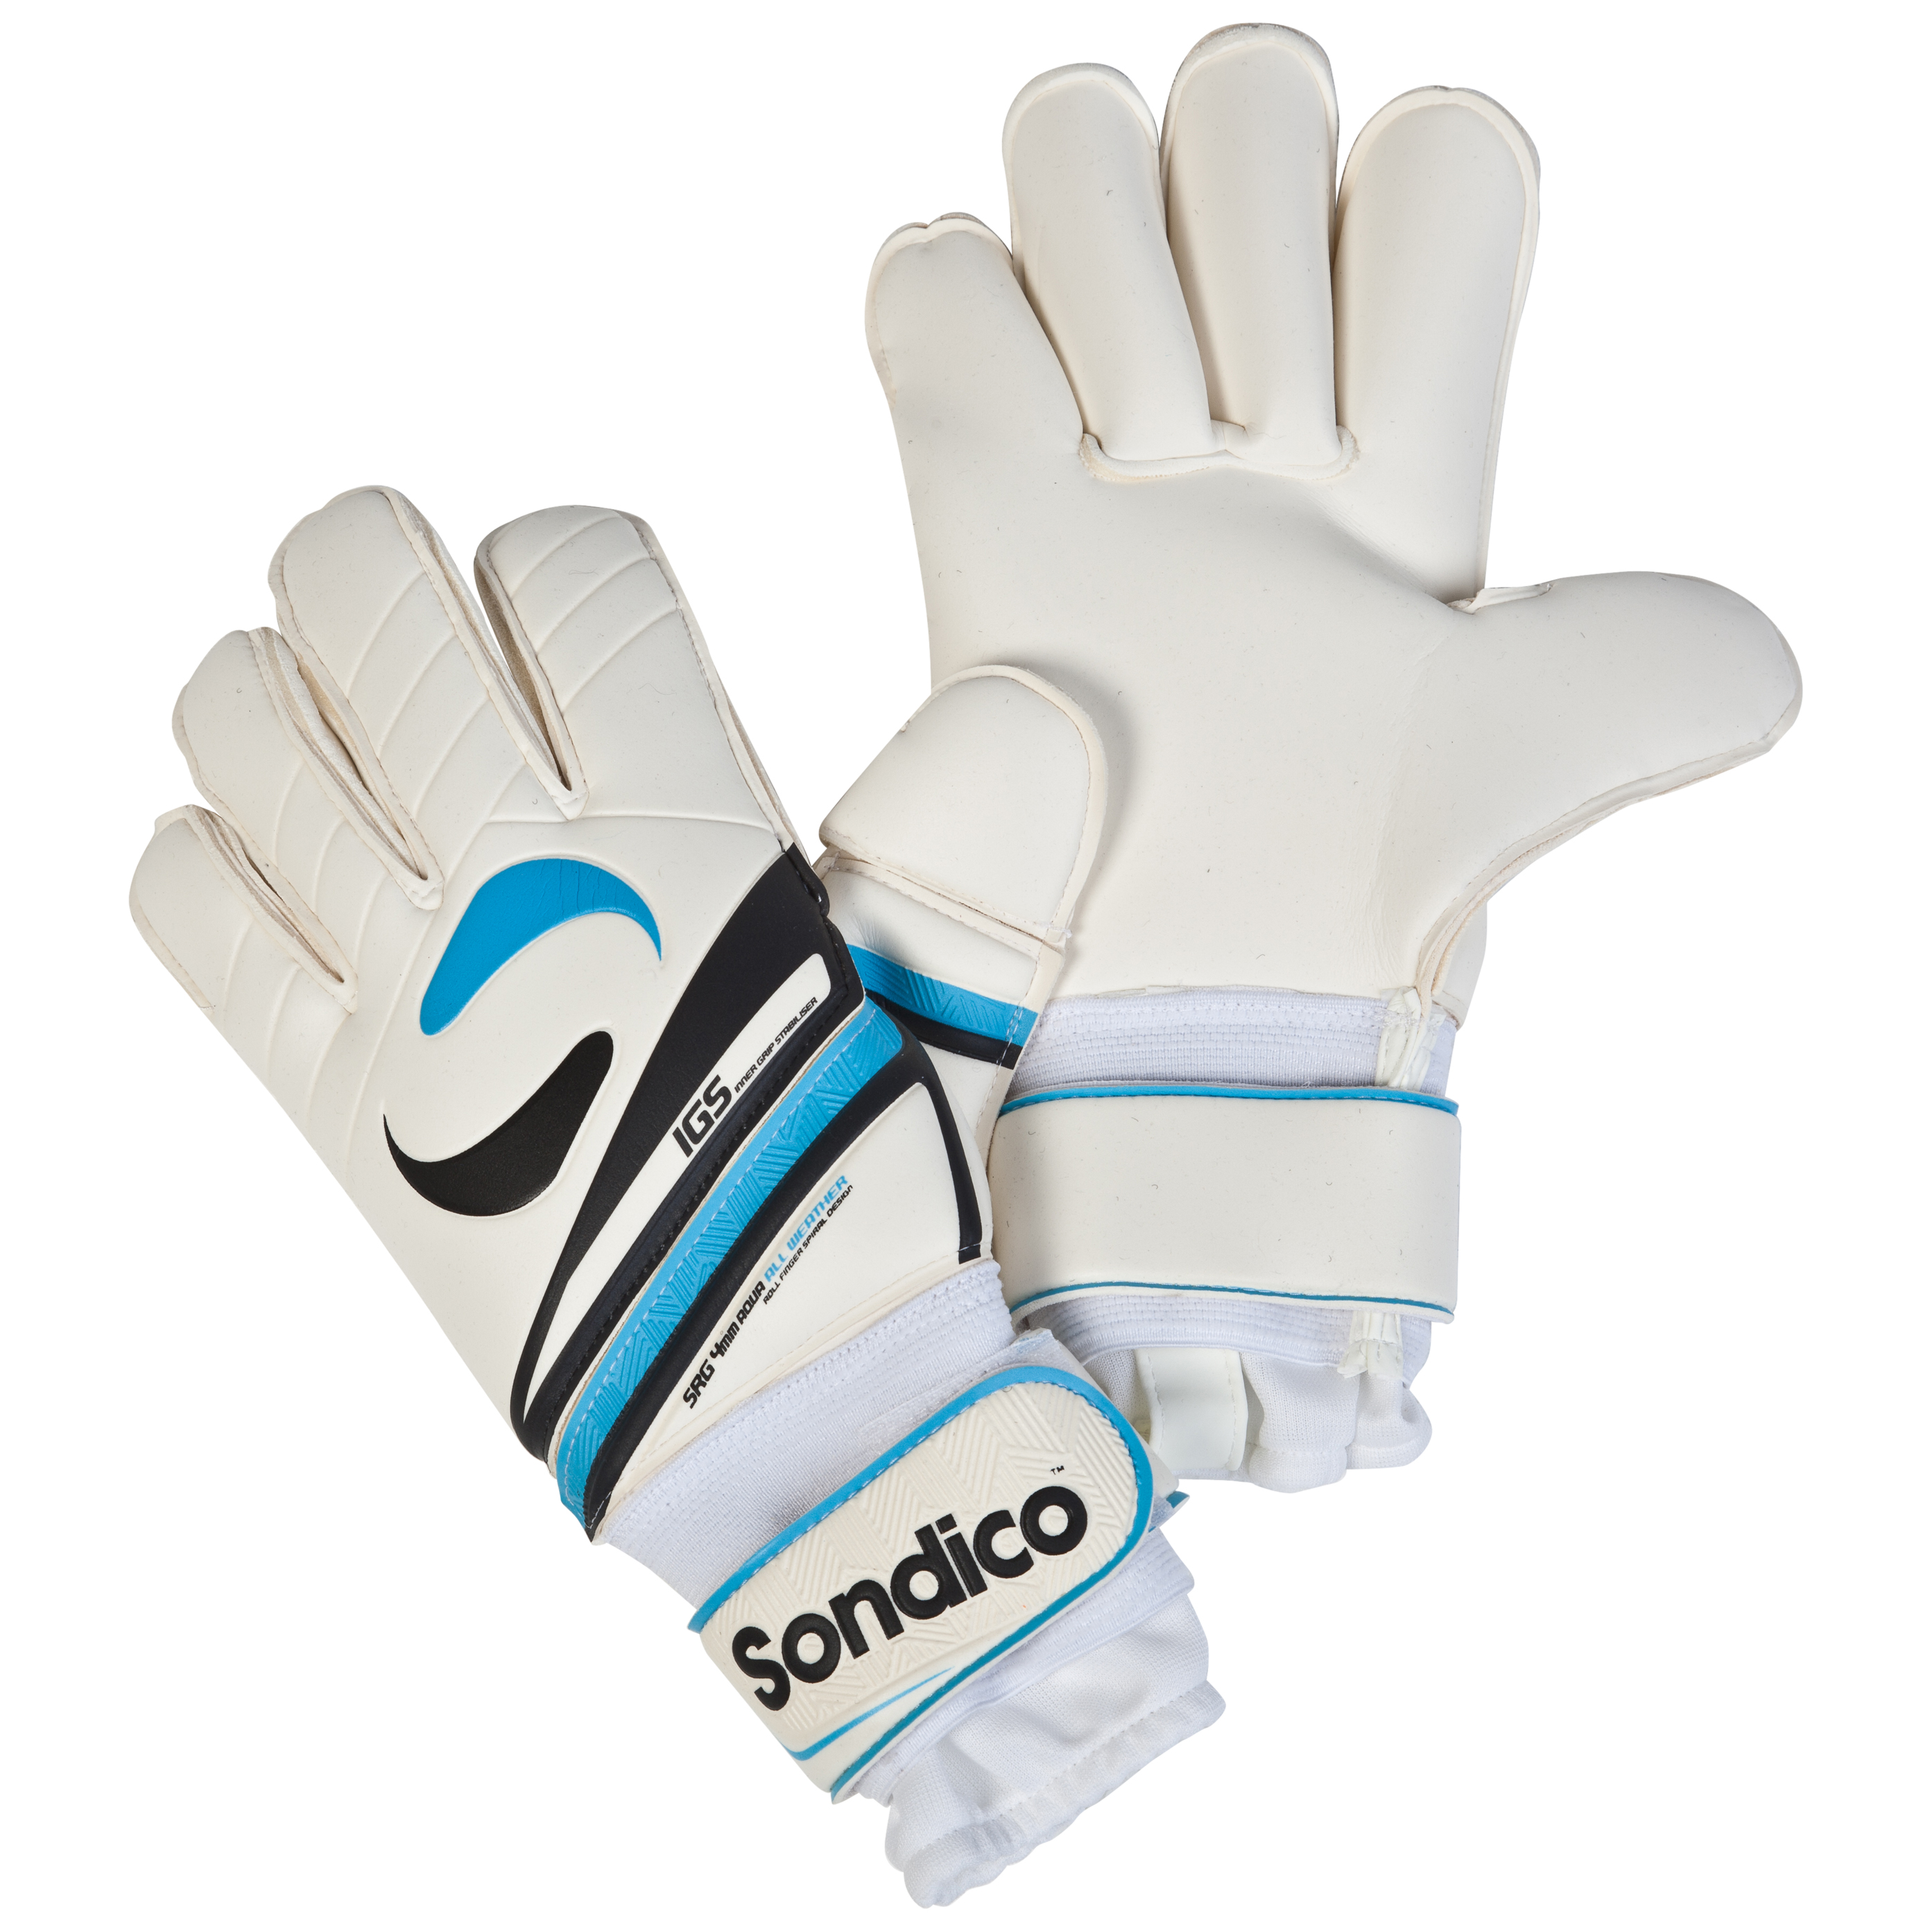 Sondico Legend Pro Roll Spiral 360 Goalkeeper Gloves - White/Black/Gun Metal/Cyan